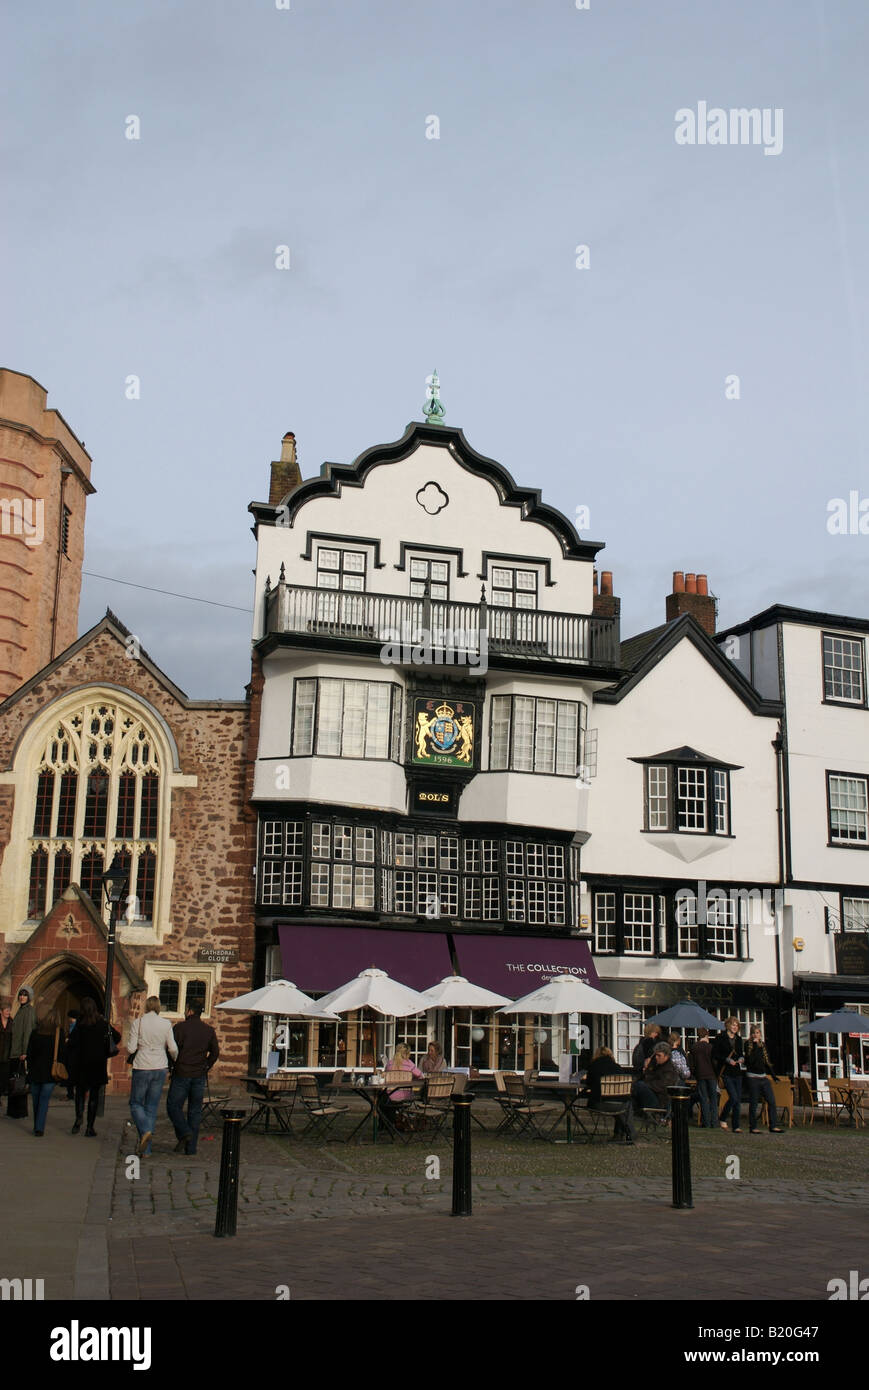 Mols Coffee house, Exeter, Devon, UK - Stock Image